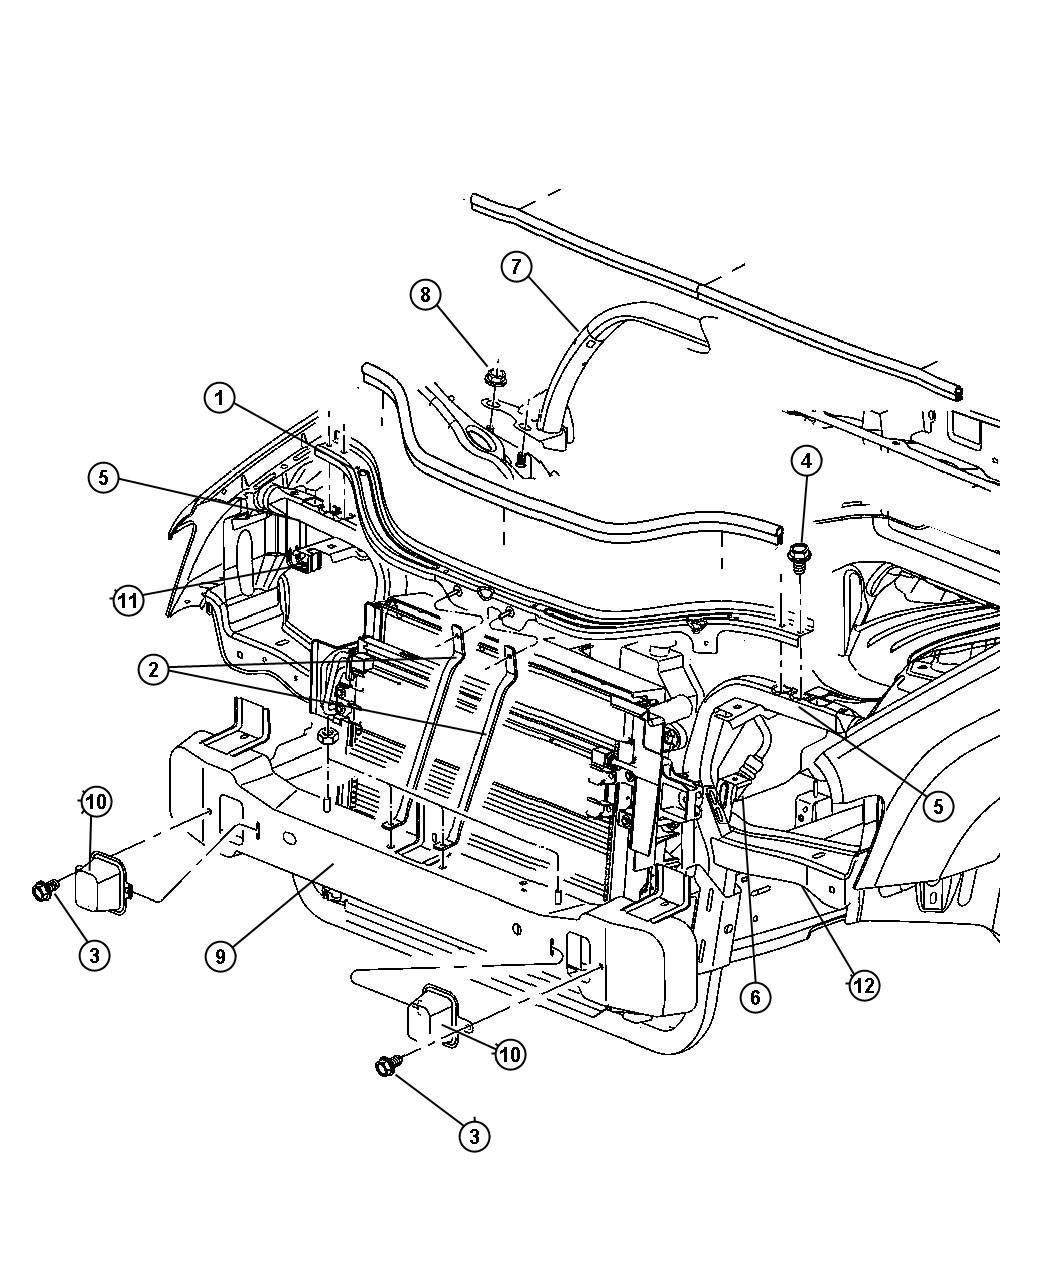 Jeep Grand Cherokee Crossmember Lower Radiator Support Upper